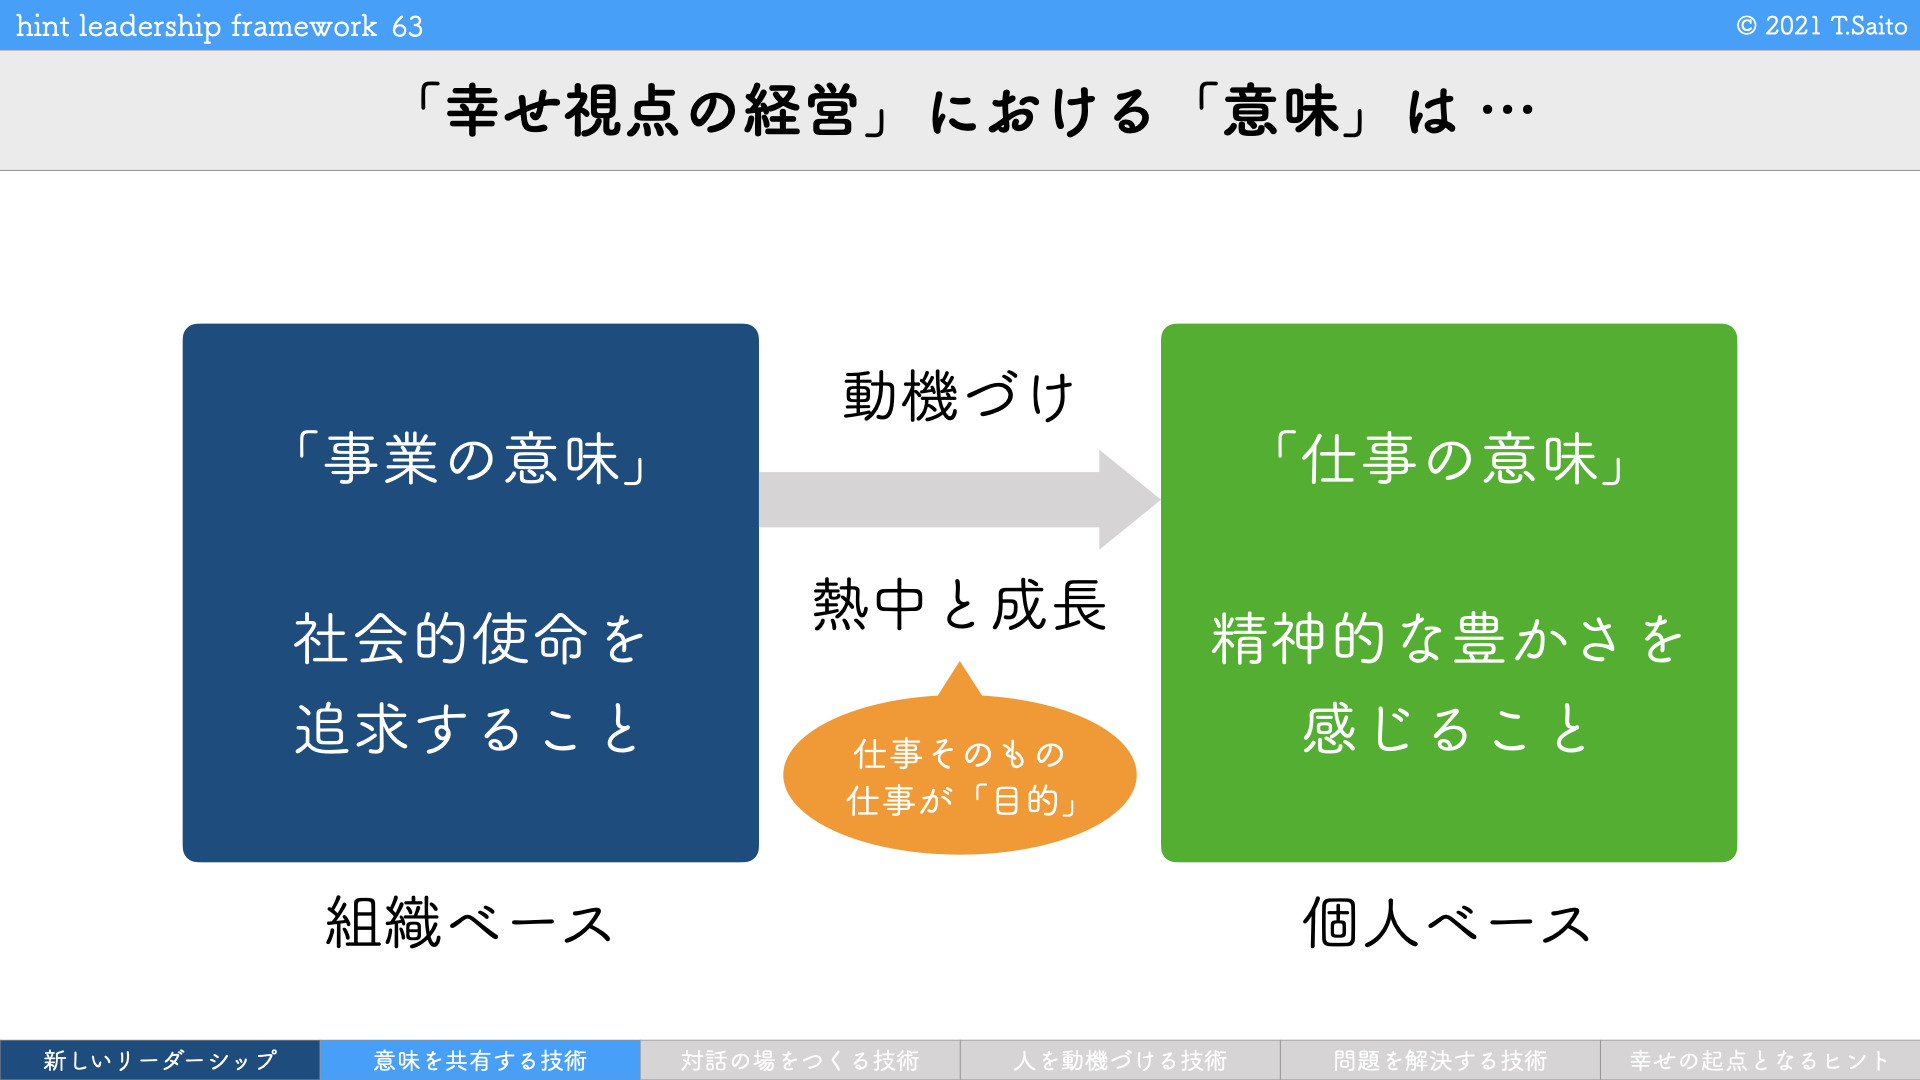 hint leadership framework 1.0.1.063